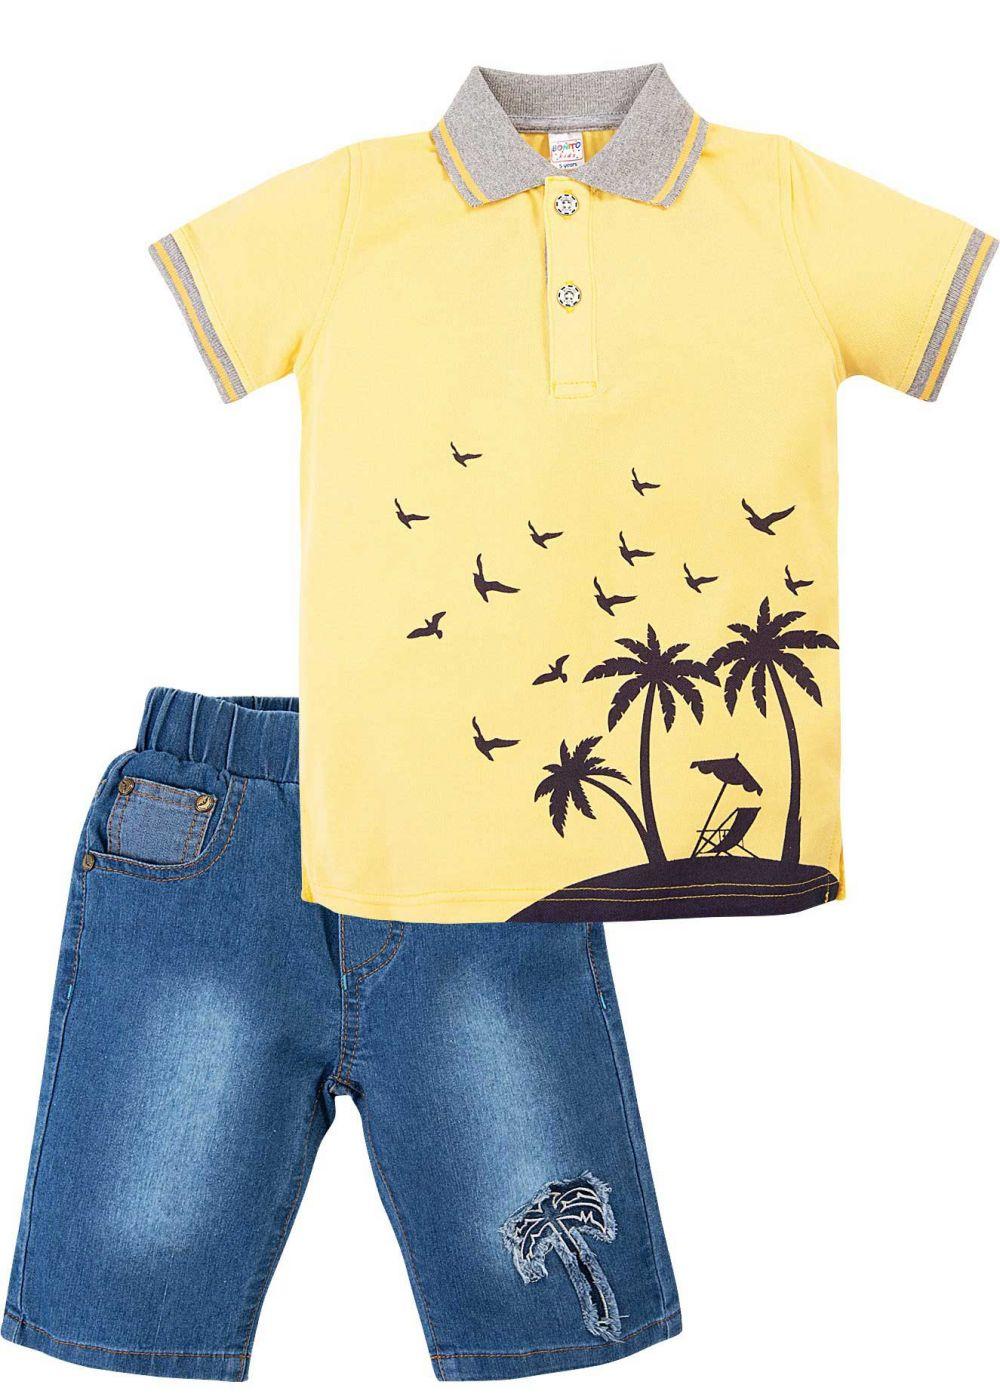 Костюм для мальчика Bonito жёлтый